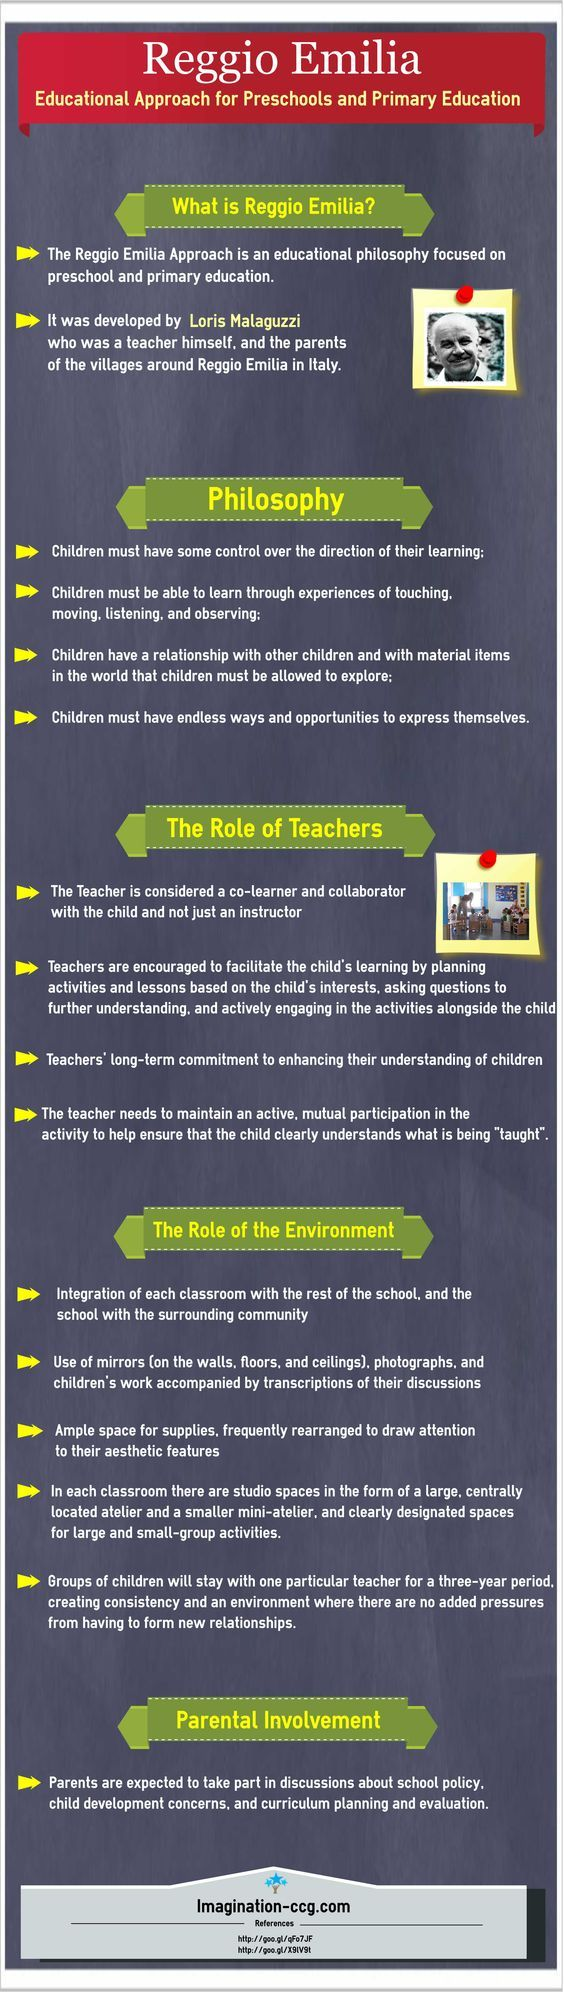 Reggio Emilia – Educational Approach for Preschools and Primary Education #Reggio Emilia #Educational Approach for Preschools: